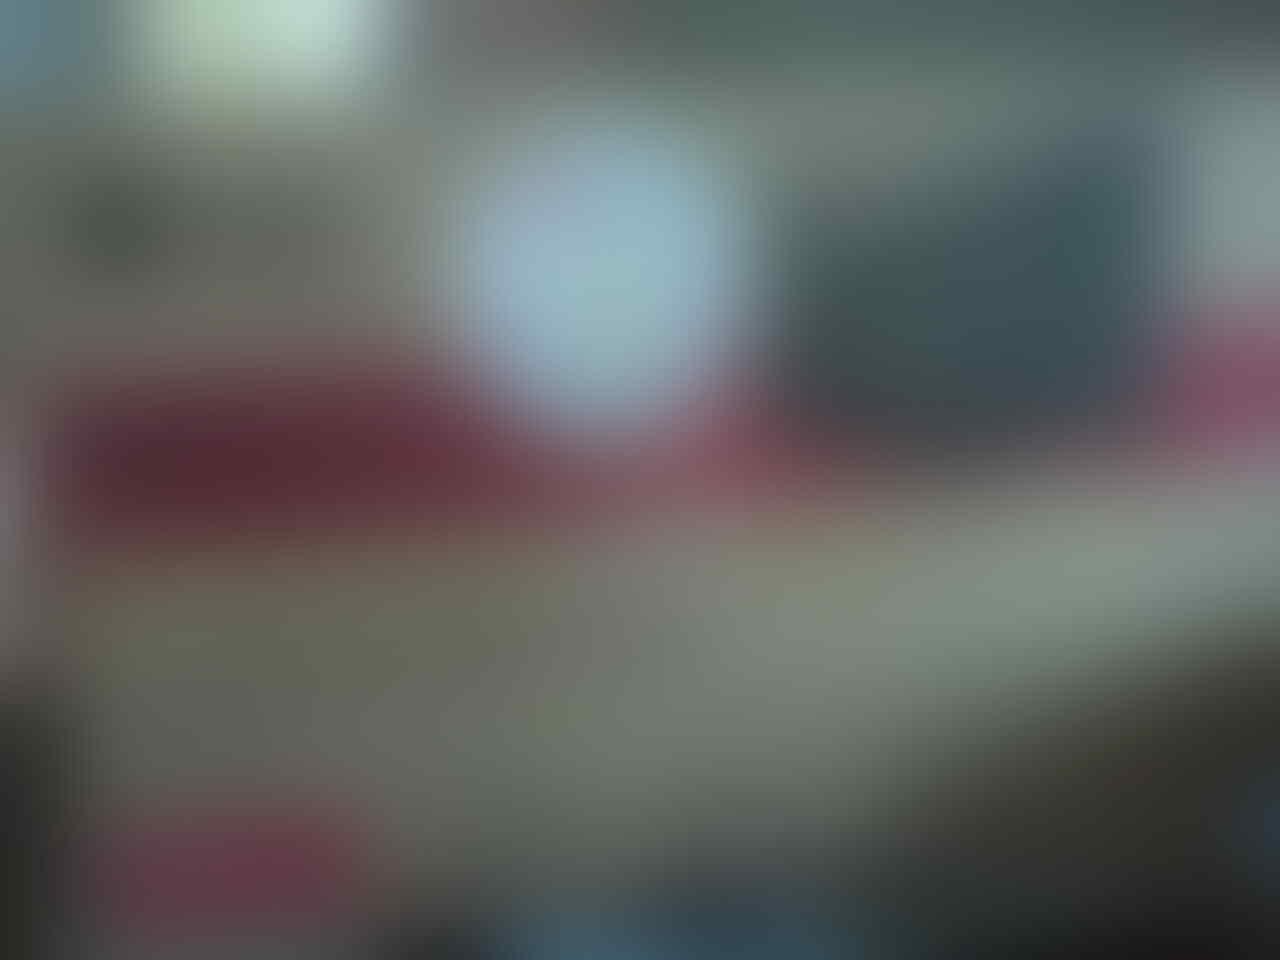 Jual TV LG LED LCD 19 INCH [ BARU ]